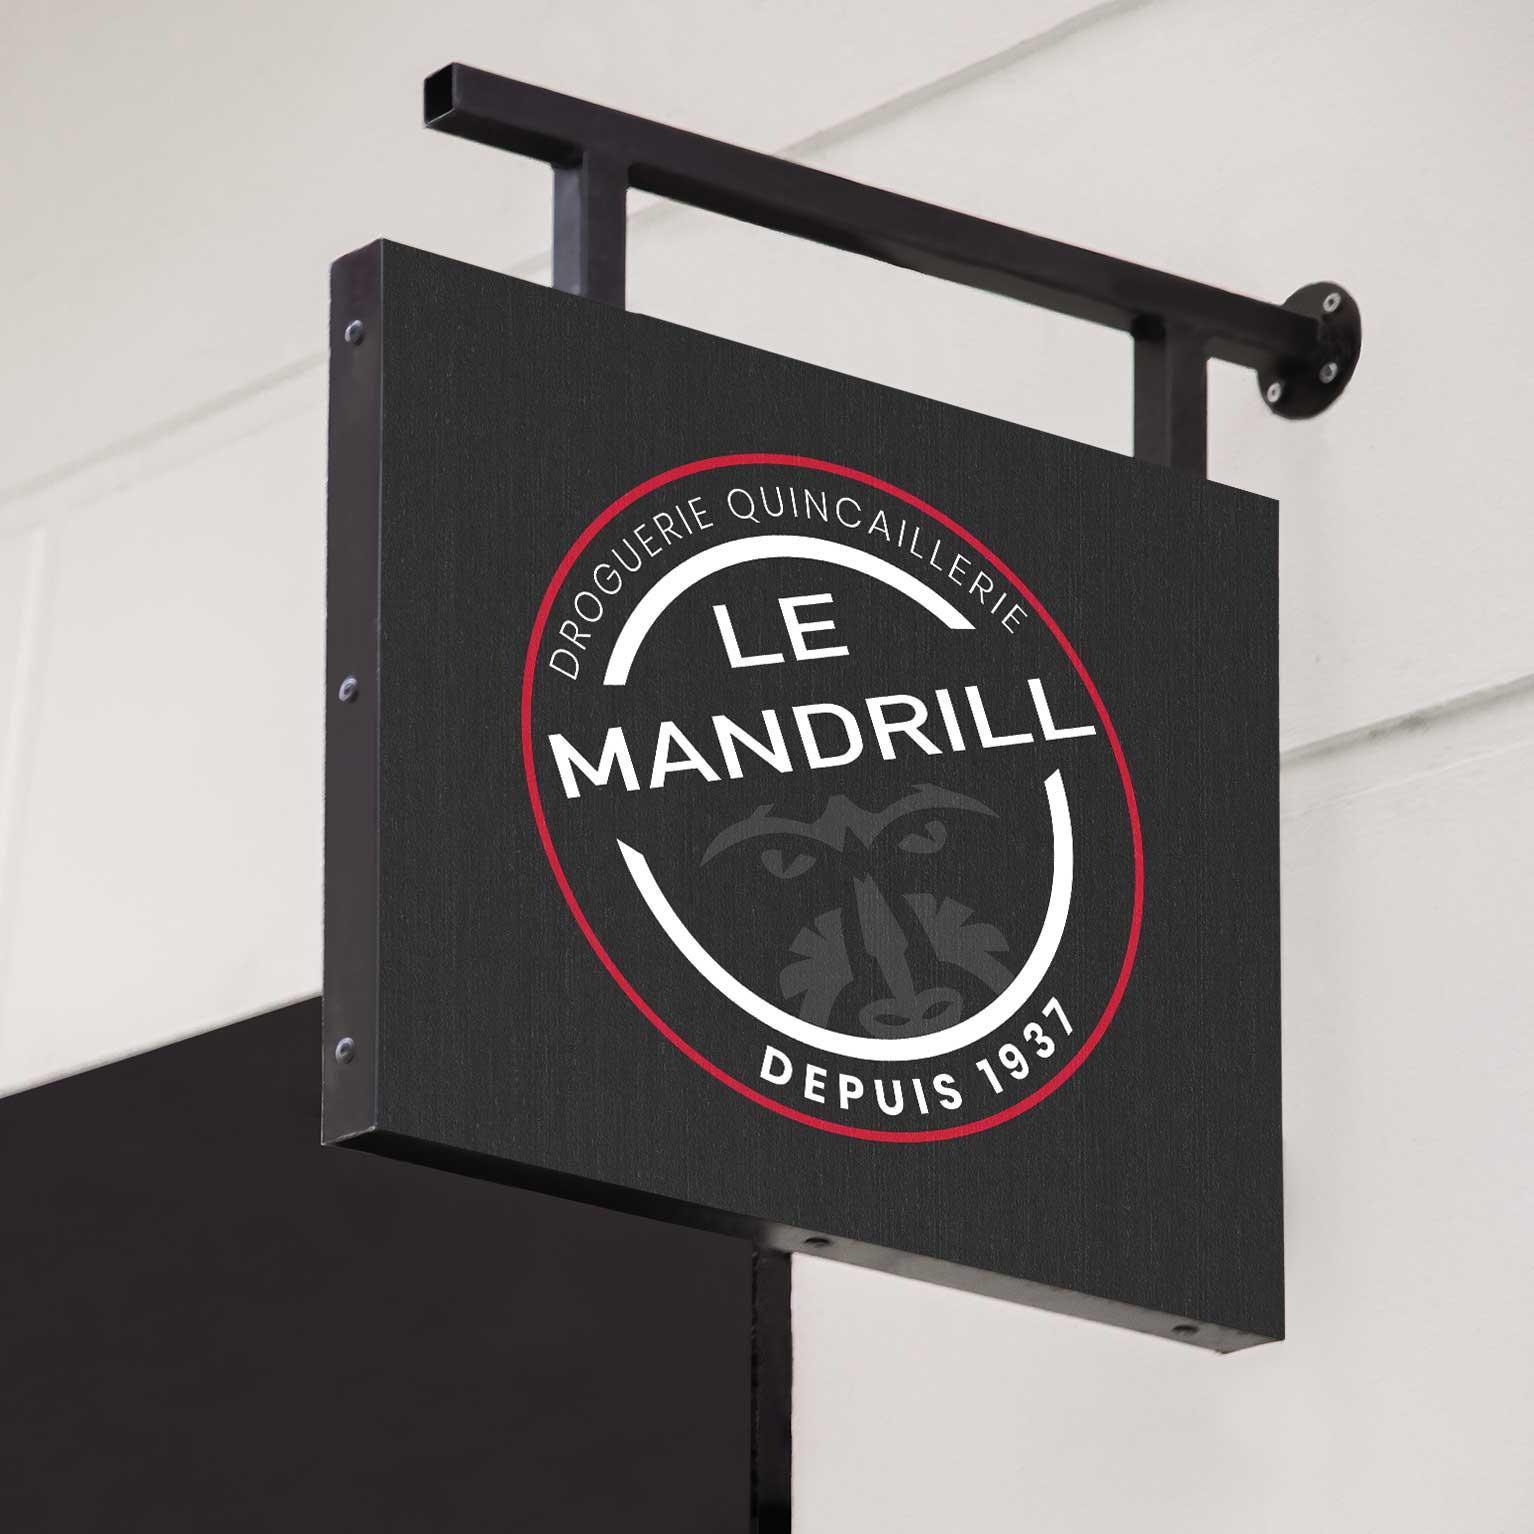 logo-enseigne-rue-SocieteLeMandrill-lemandrill-70- boulevardAlsaceLorraine-bayonne-commercedeproximite-drogueries-quincaillerie